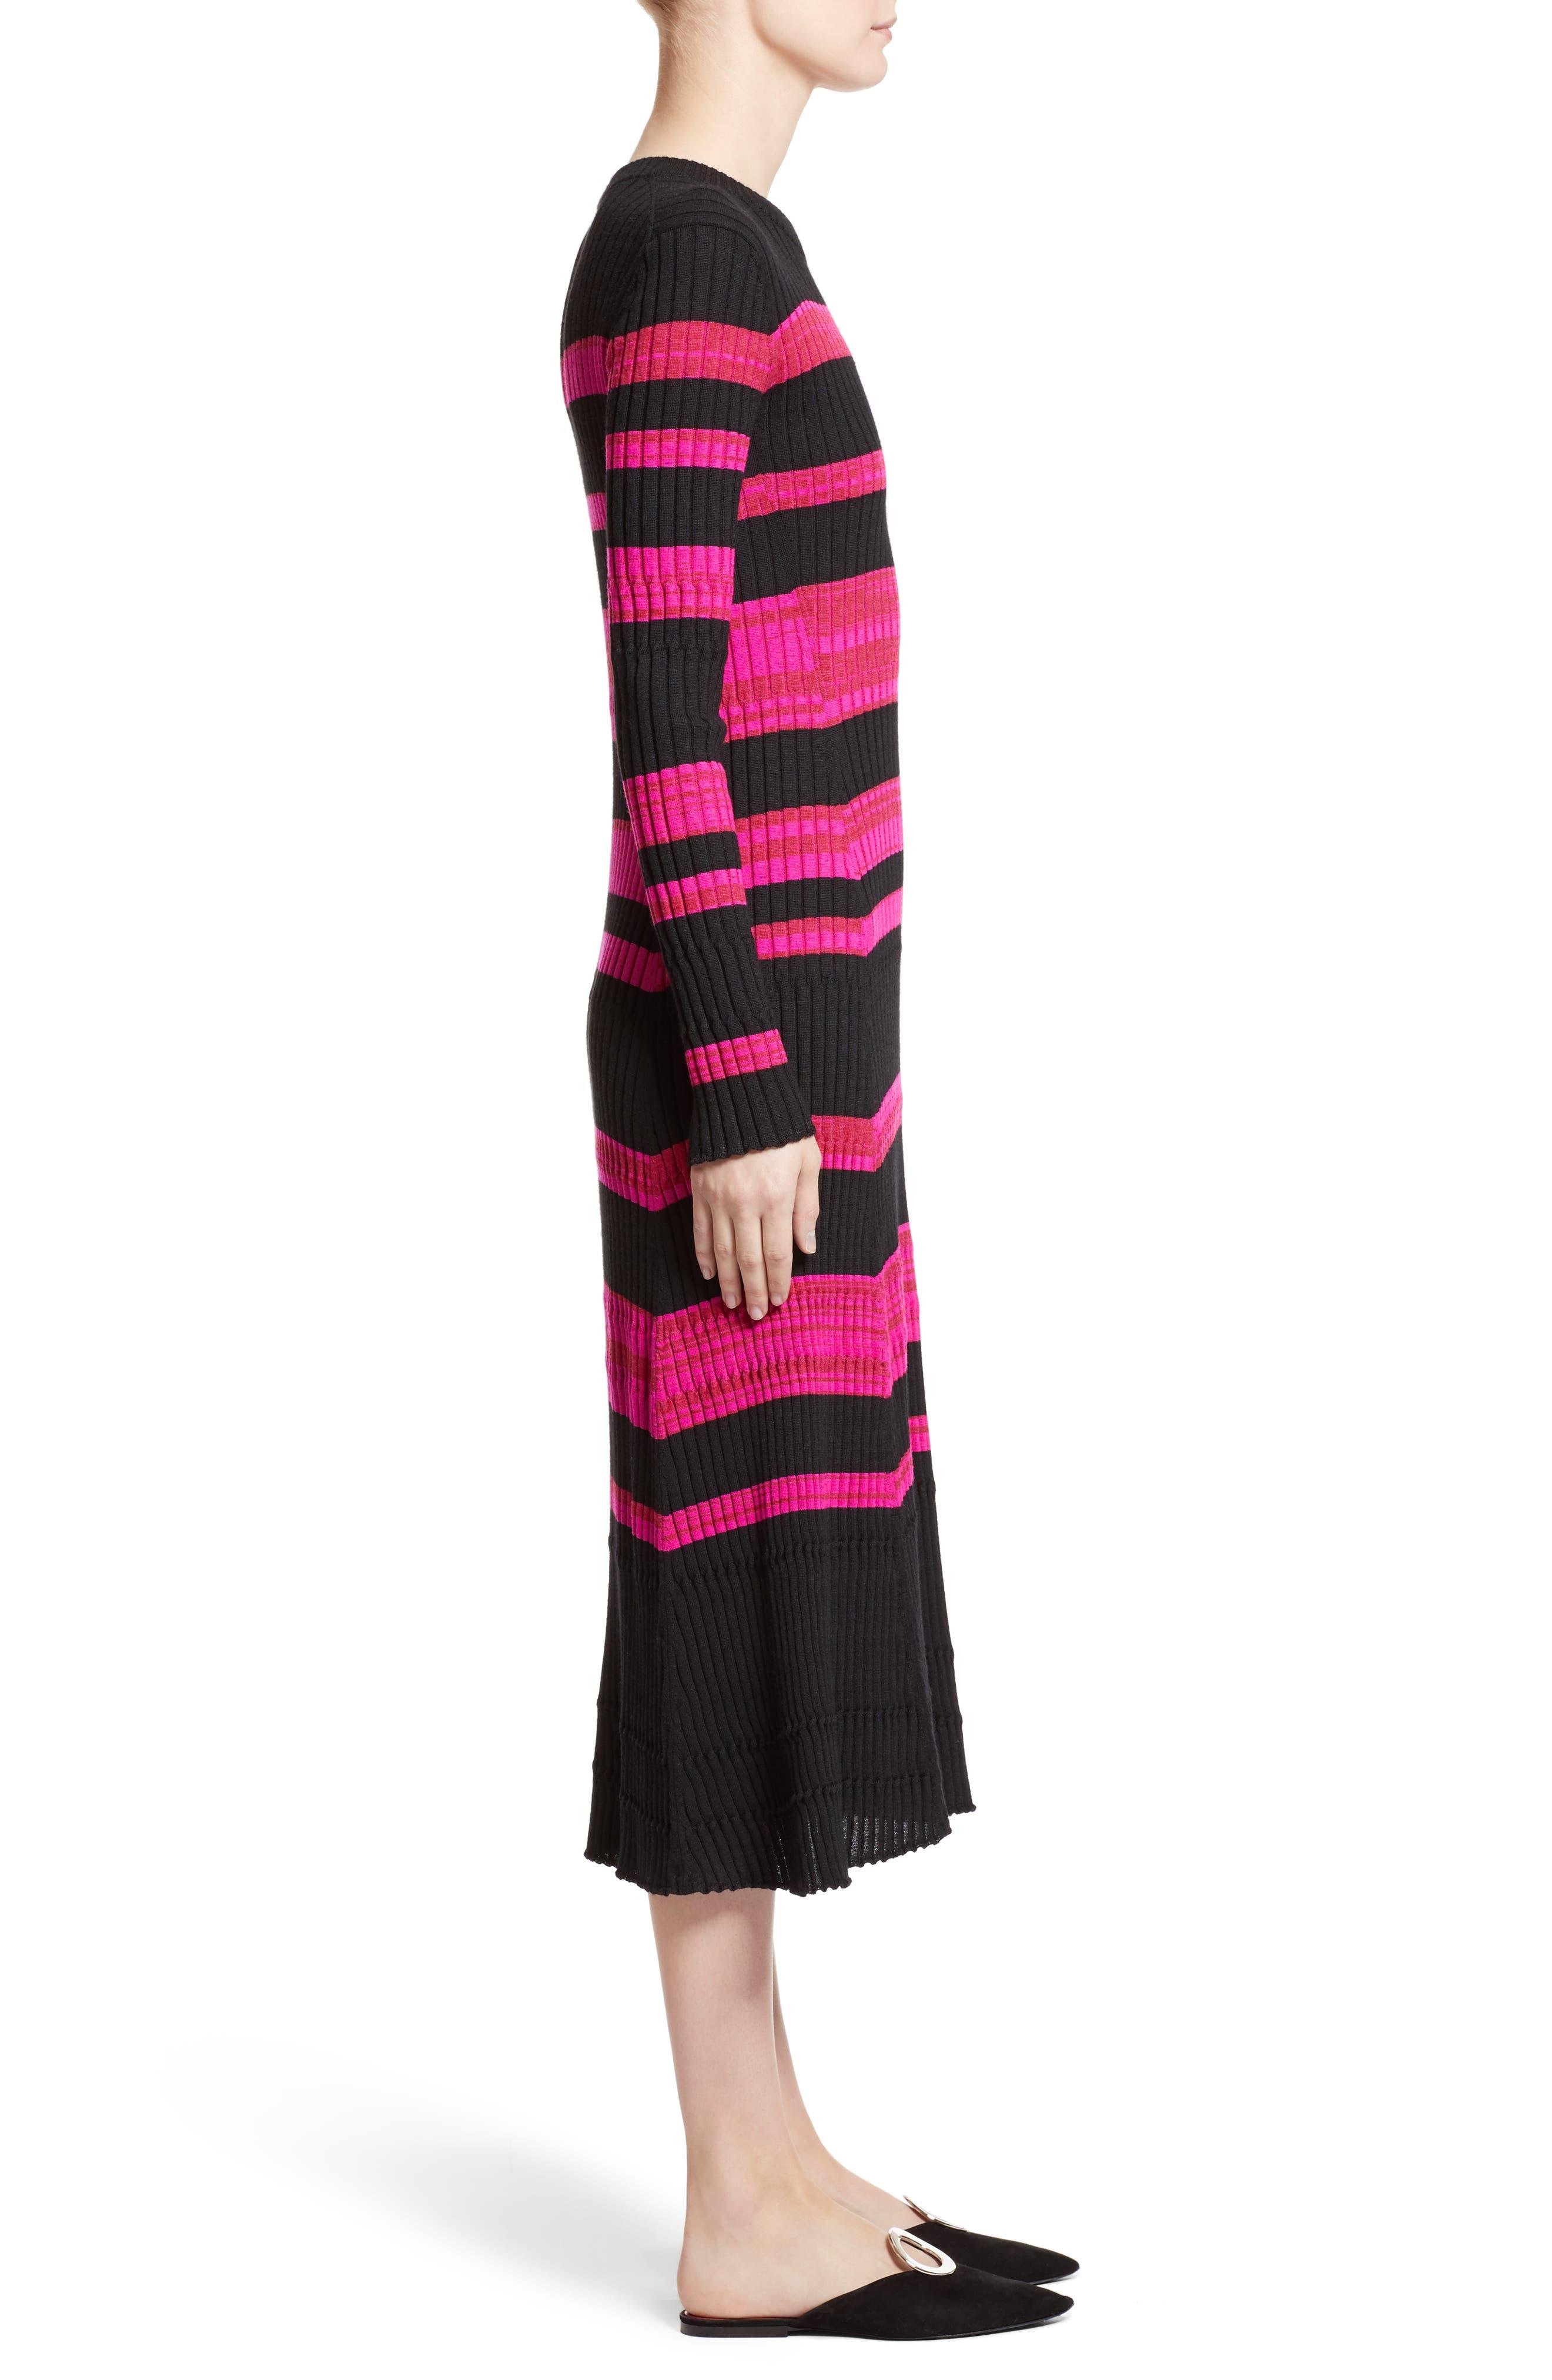 Stripe Cashmere, Wool & Silk Midi Dress,                             Alternate thumbnail 4, color,                             Black/ Electric Pink Multi